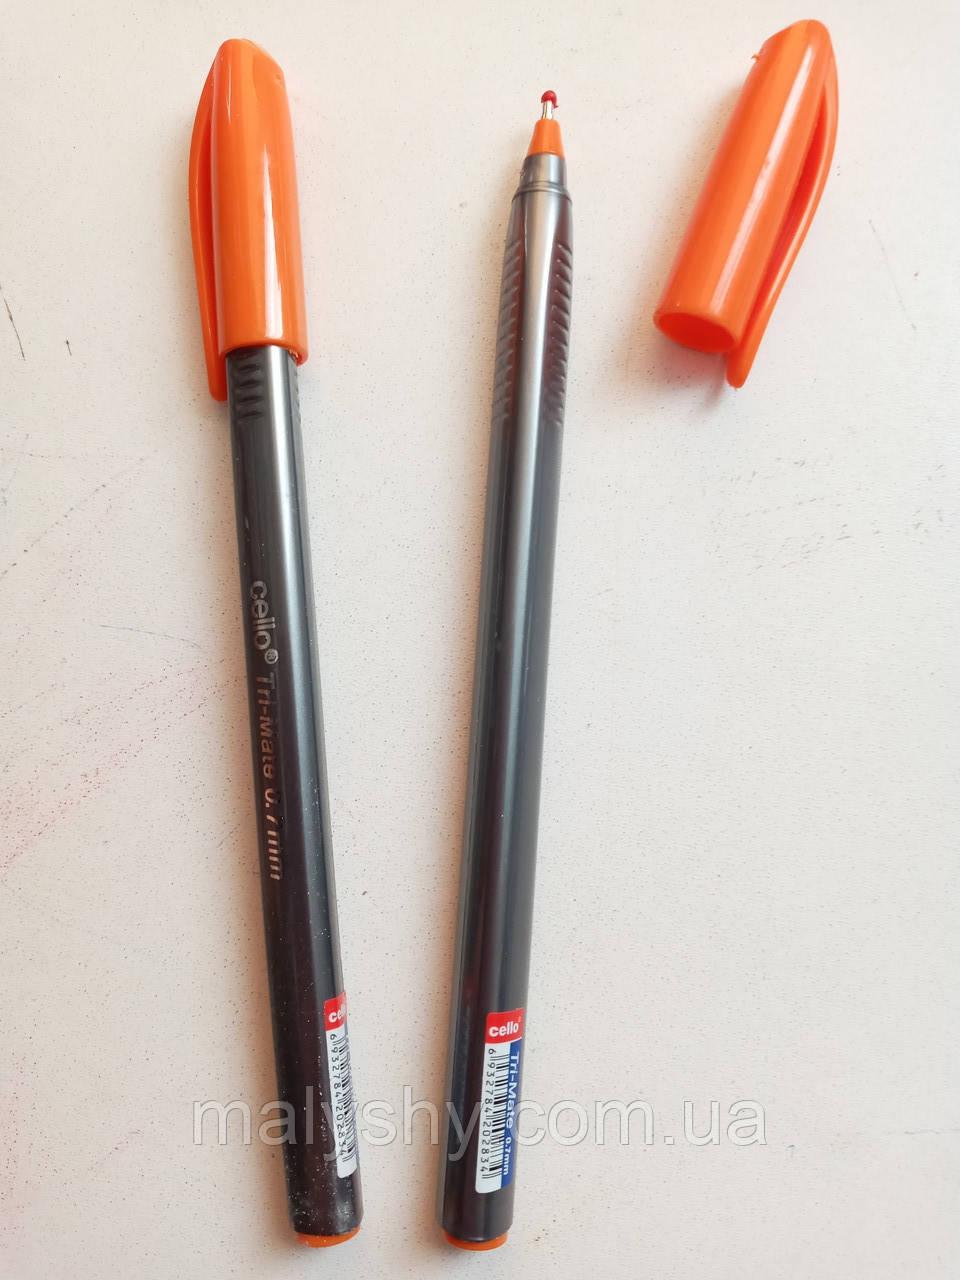 Ручка масляная «Tri-Mate» Cello оранжевая / шариковая / ручка масляна помаранчева  /CL-1779 В